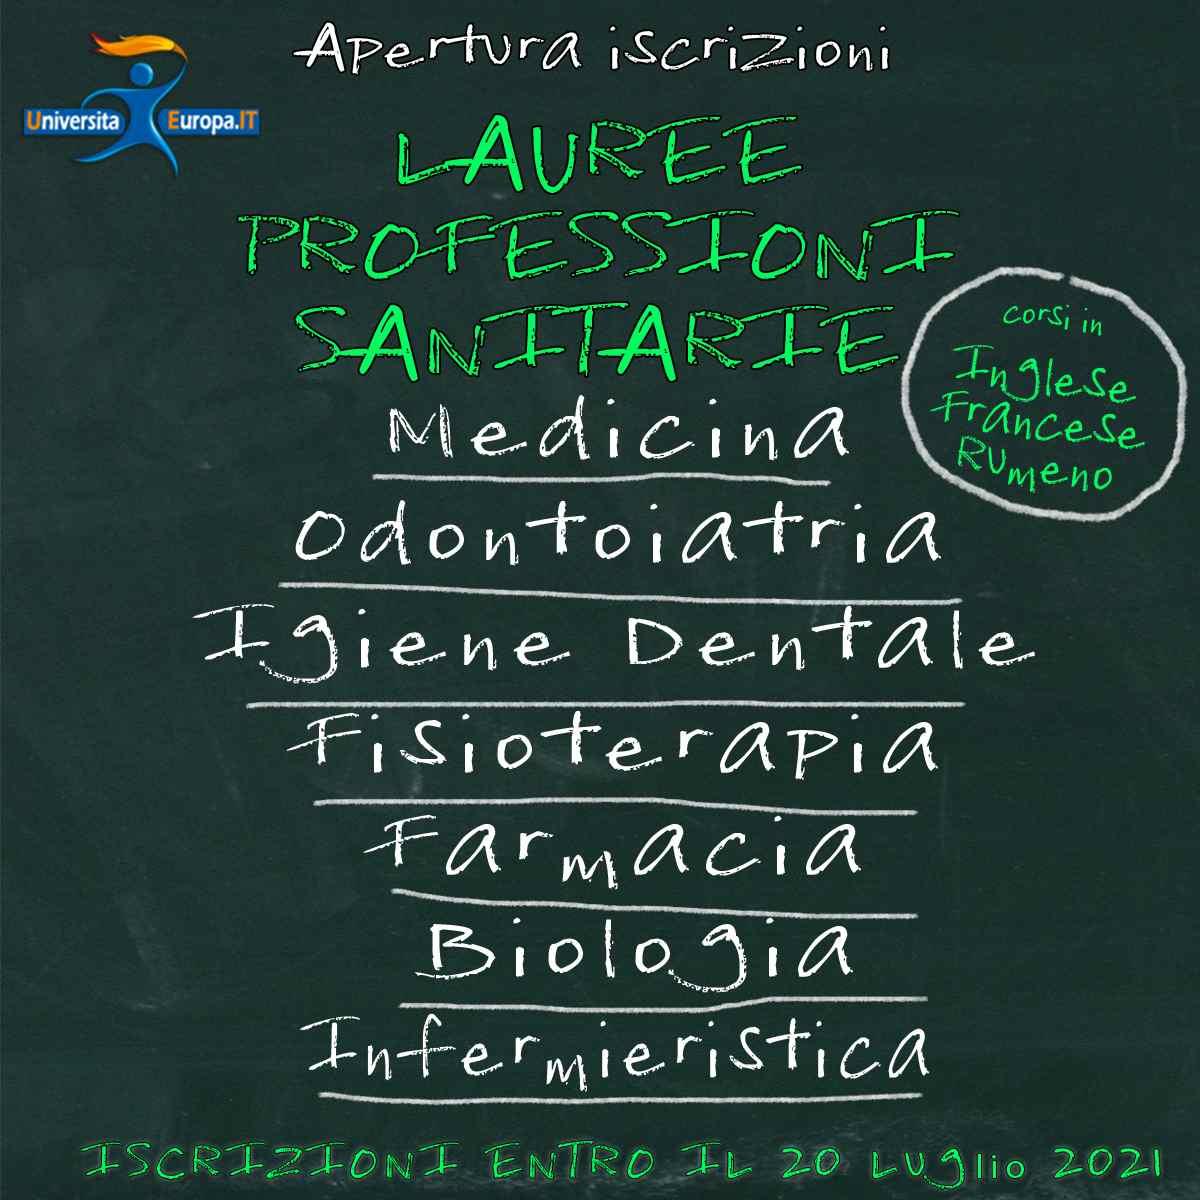 lauree professioni sanitarie